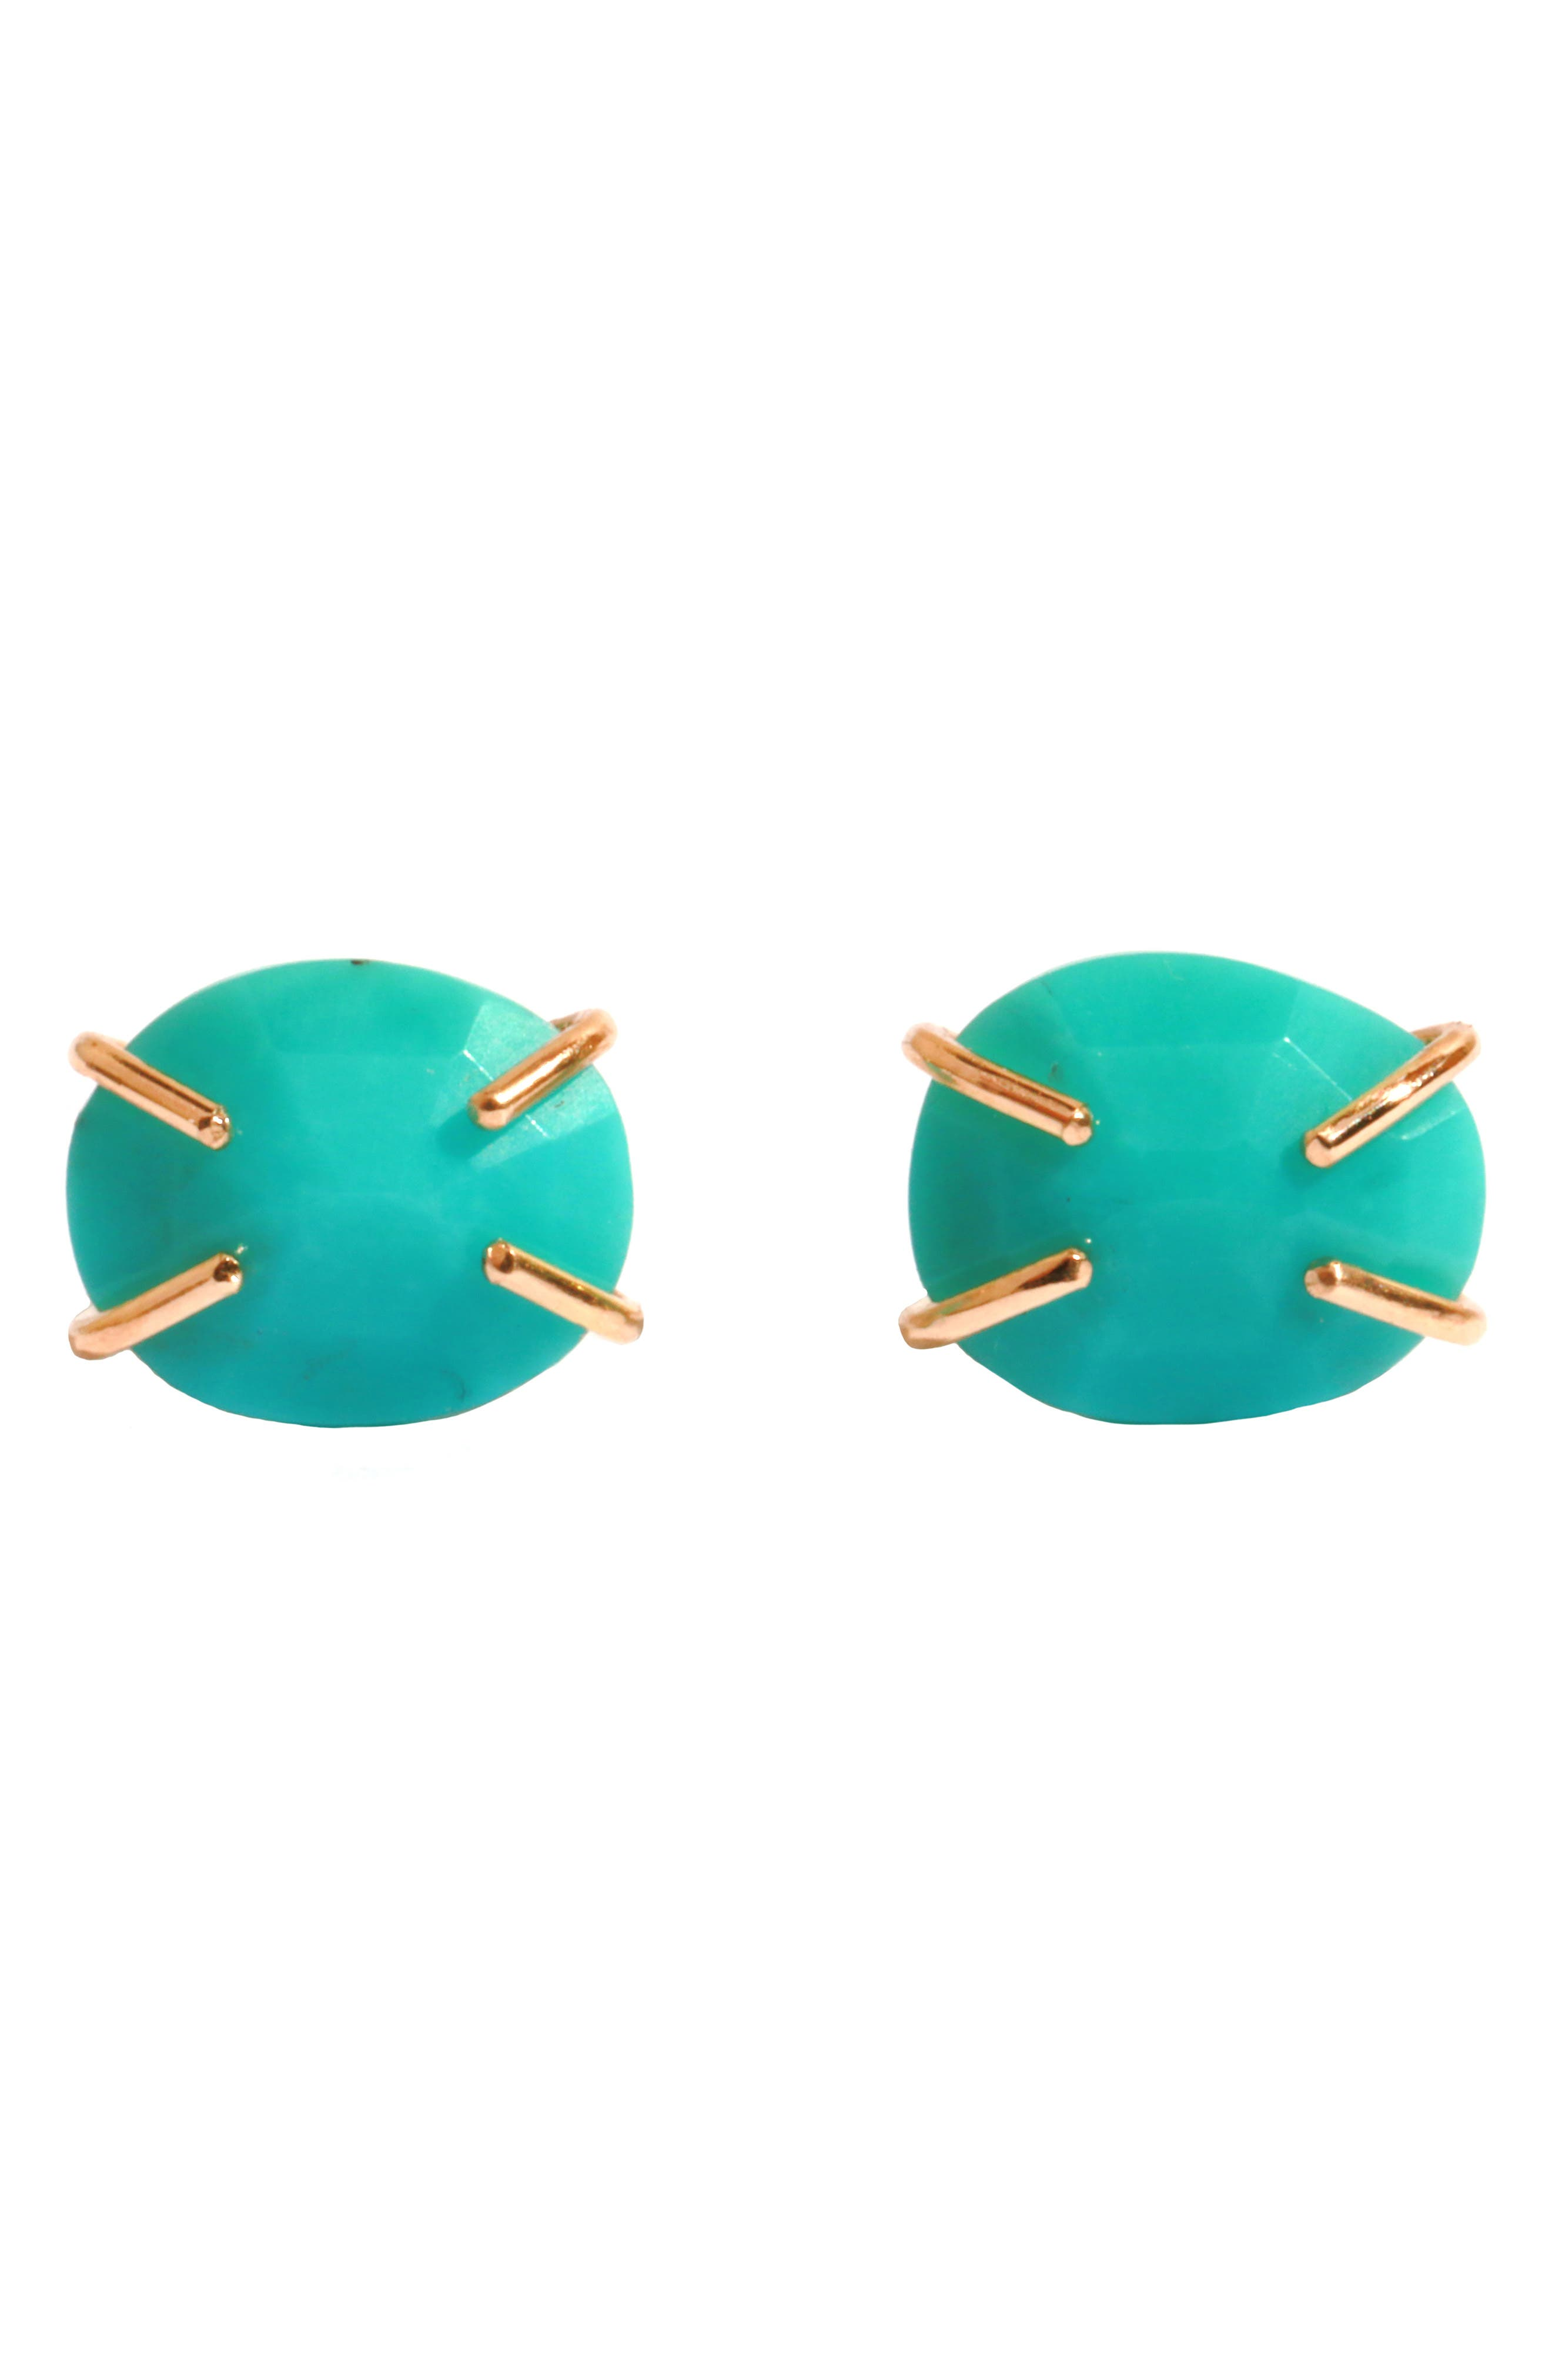 Main Image - Melissa Joy Manning Turquoise Prong Stud Earrings